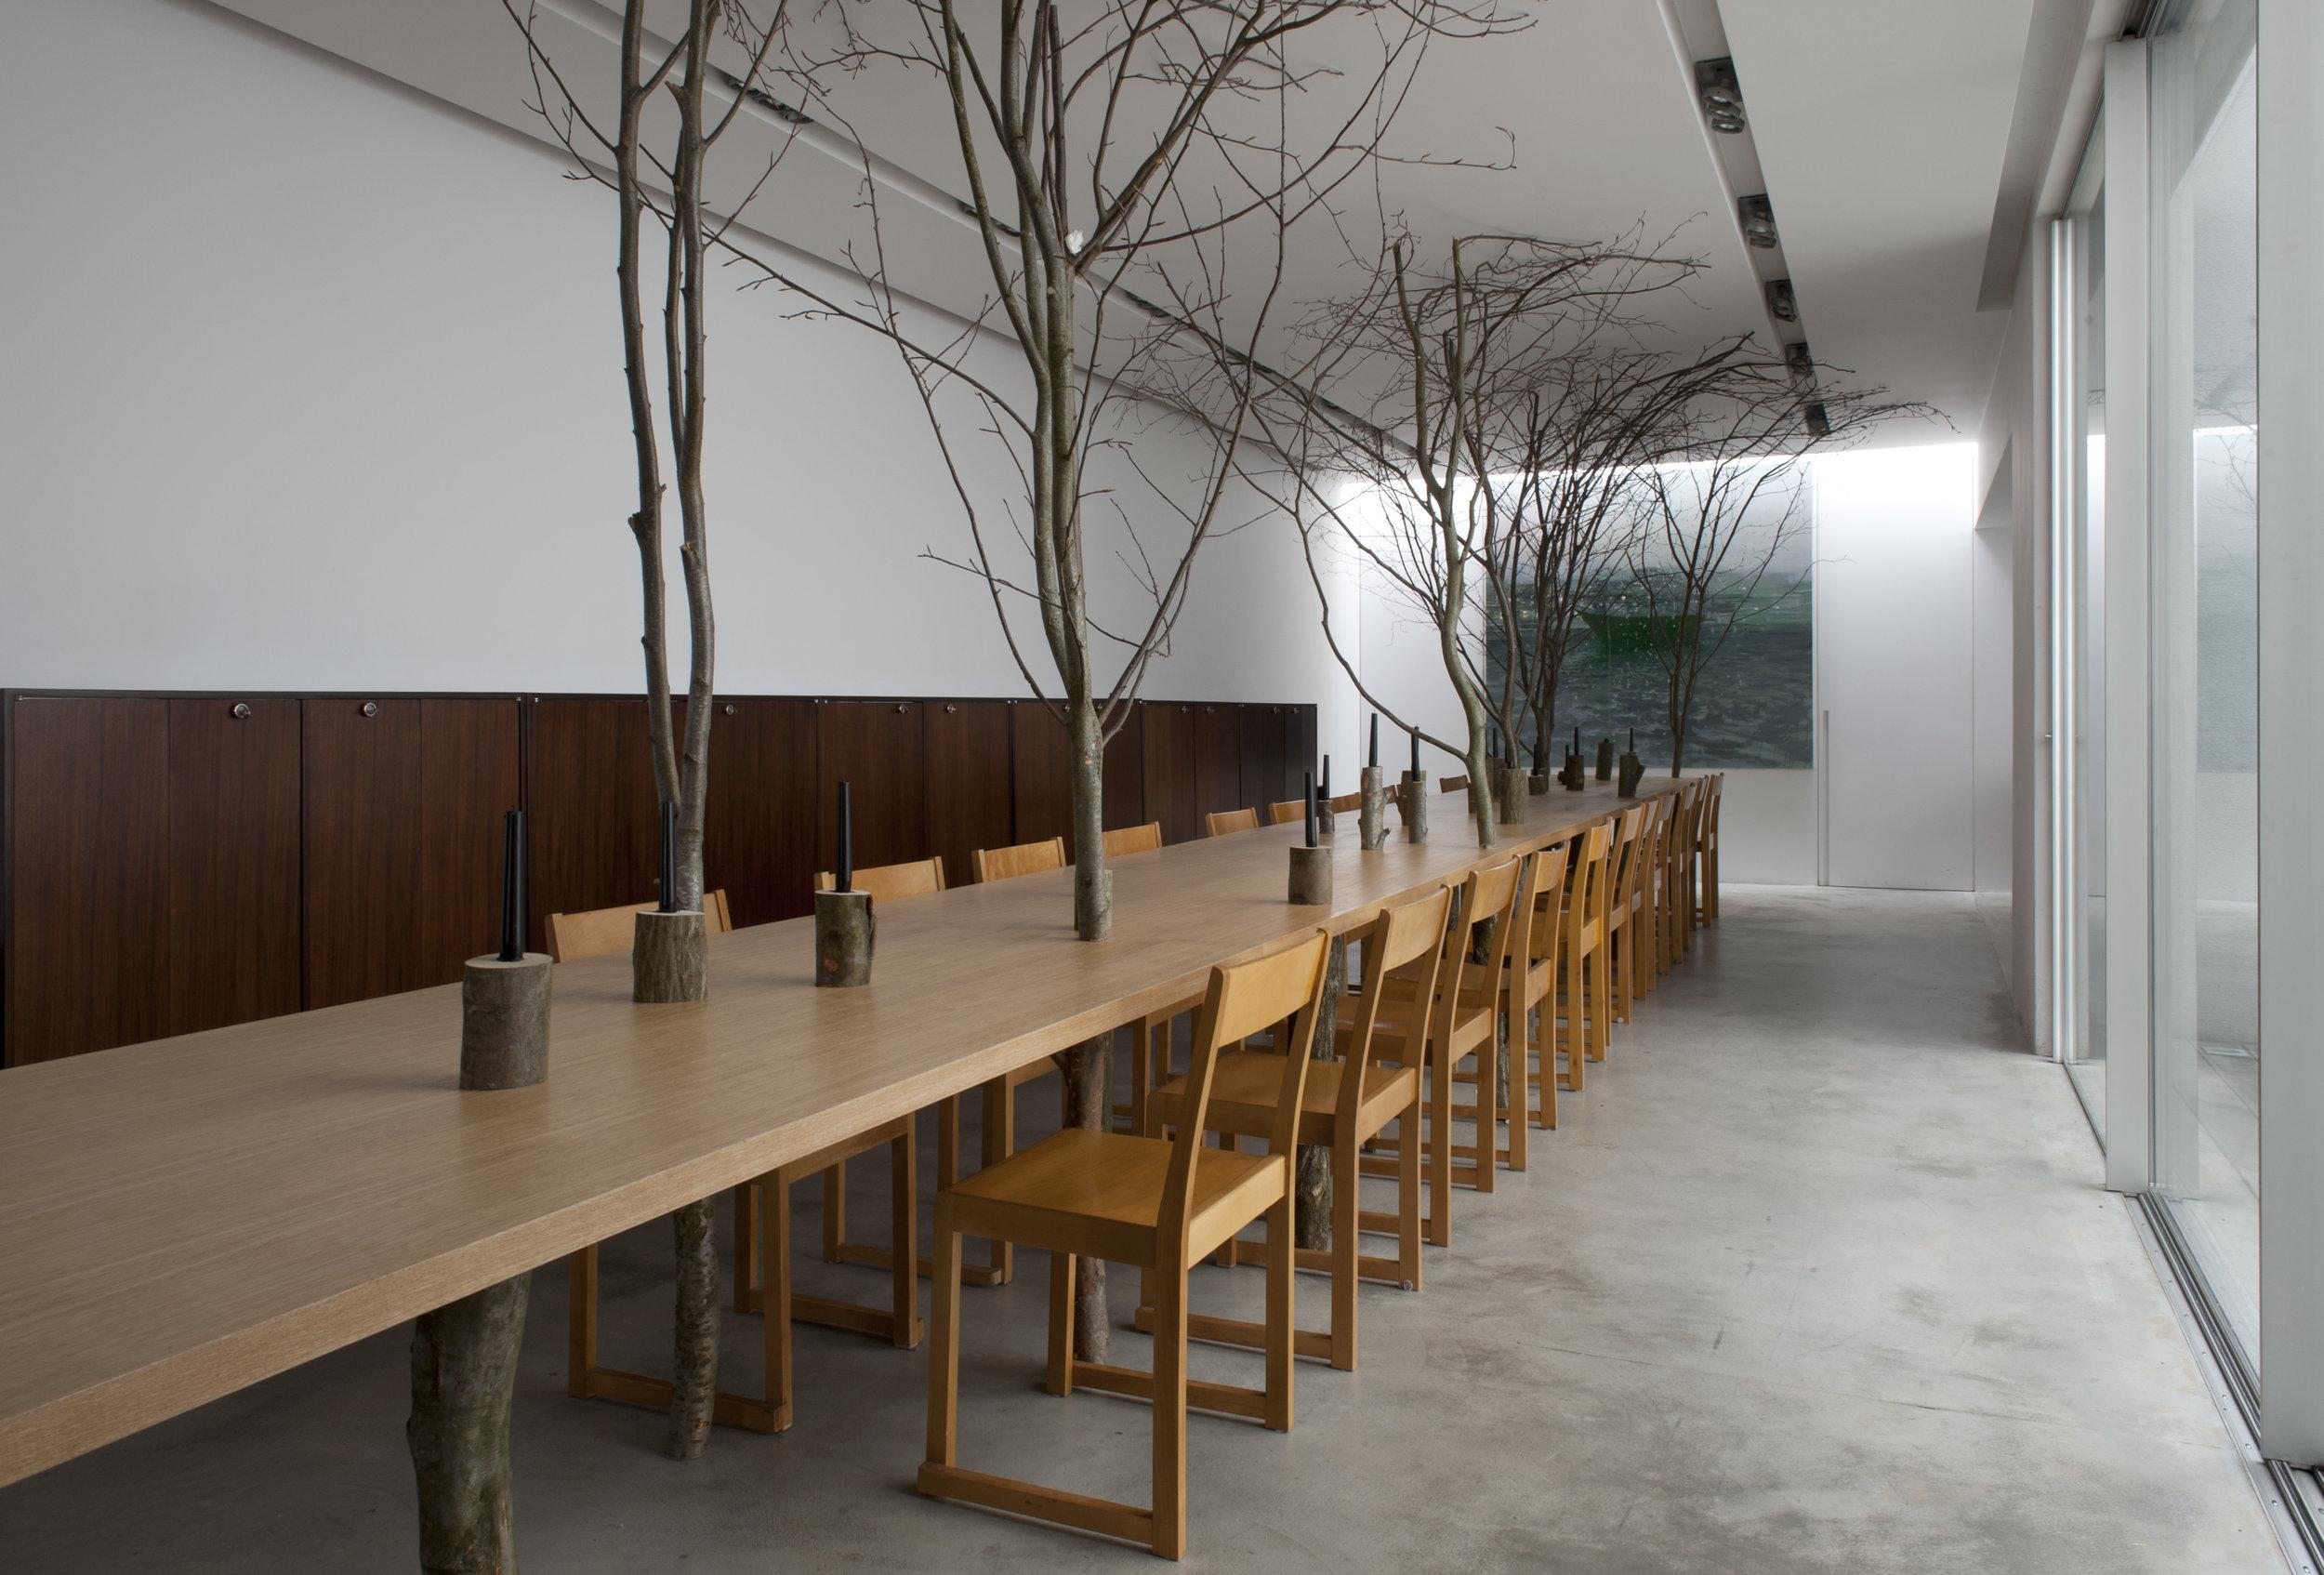 Table arbre pour Hermes .jpg